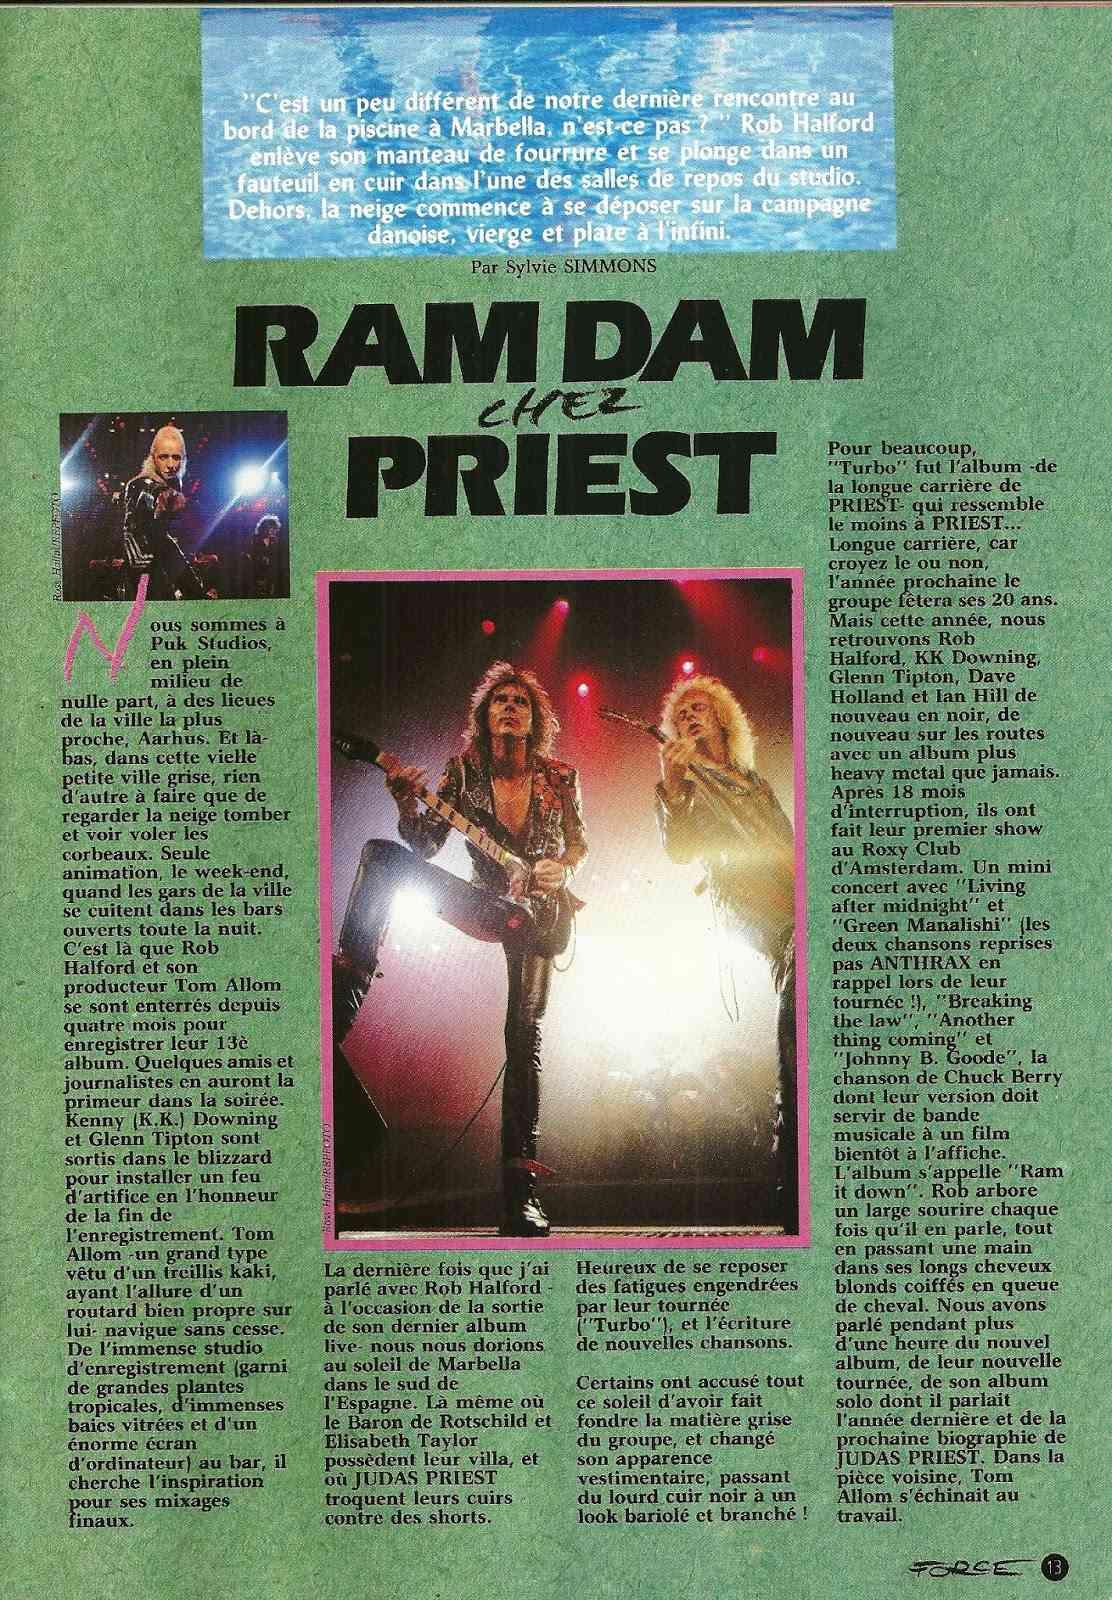 JUDAS PRIEST Ram Dam chez Priest (Hard Force Mai 1988) Archive à lire Numyri43